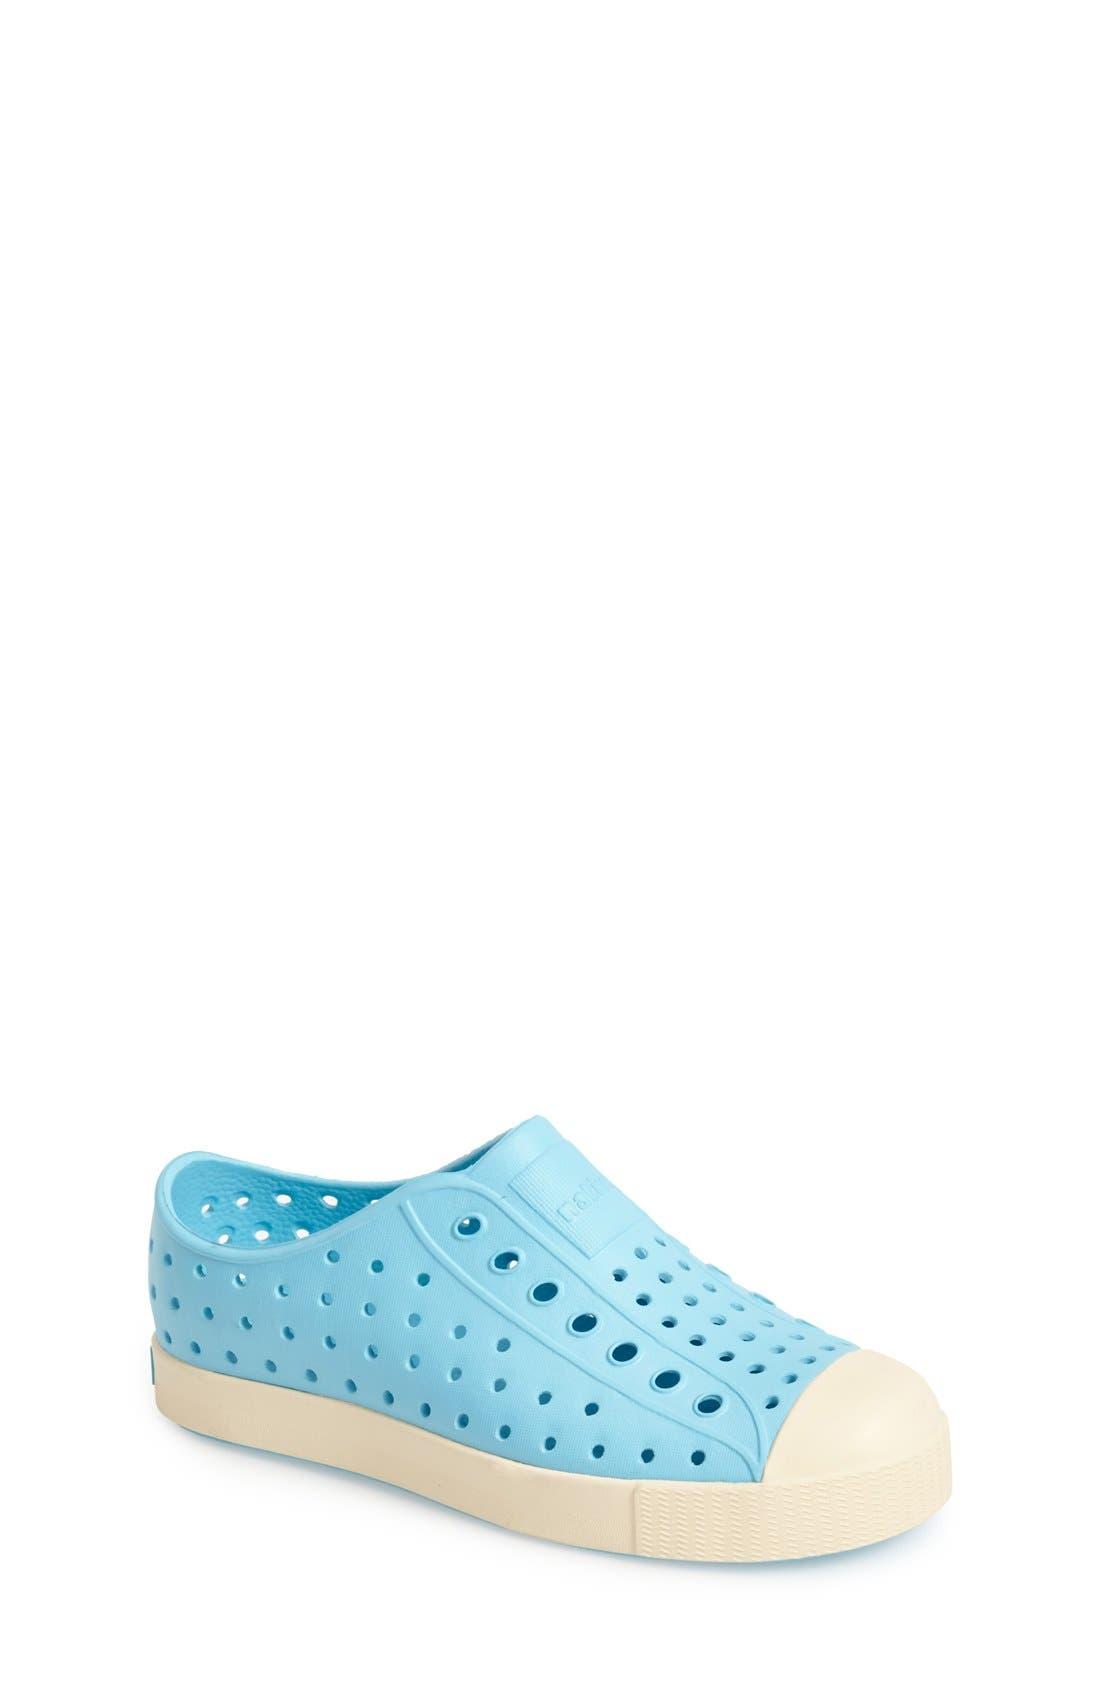 'Jefferson' Water Friendly Slip-On Sneaker,                             Main thumbnail 46, color,